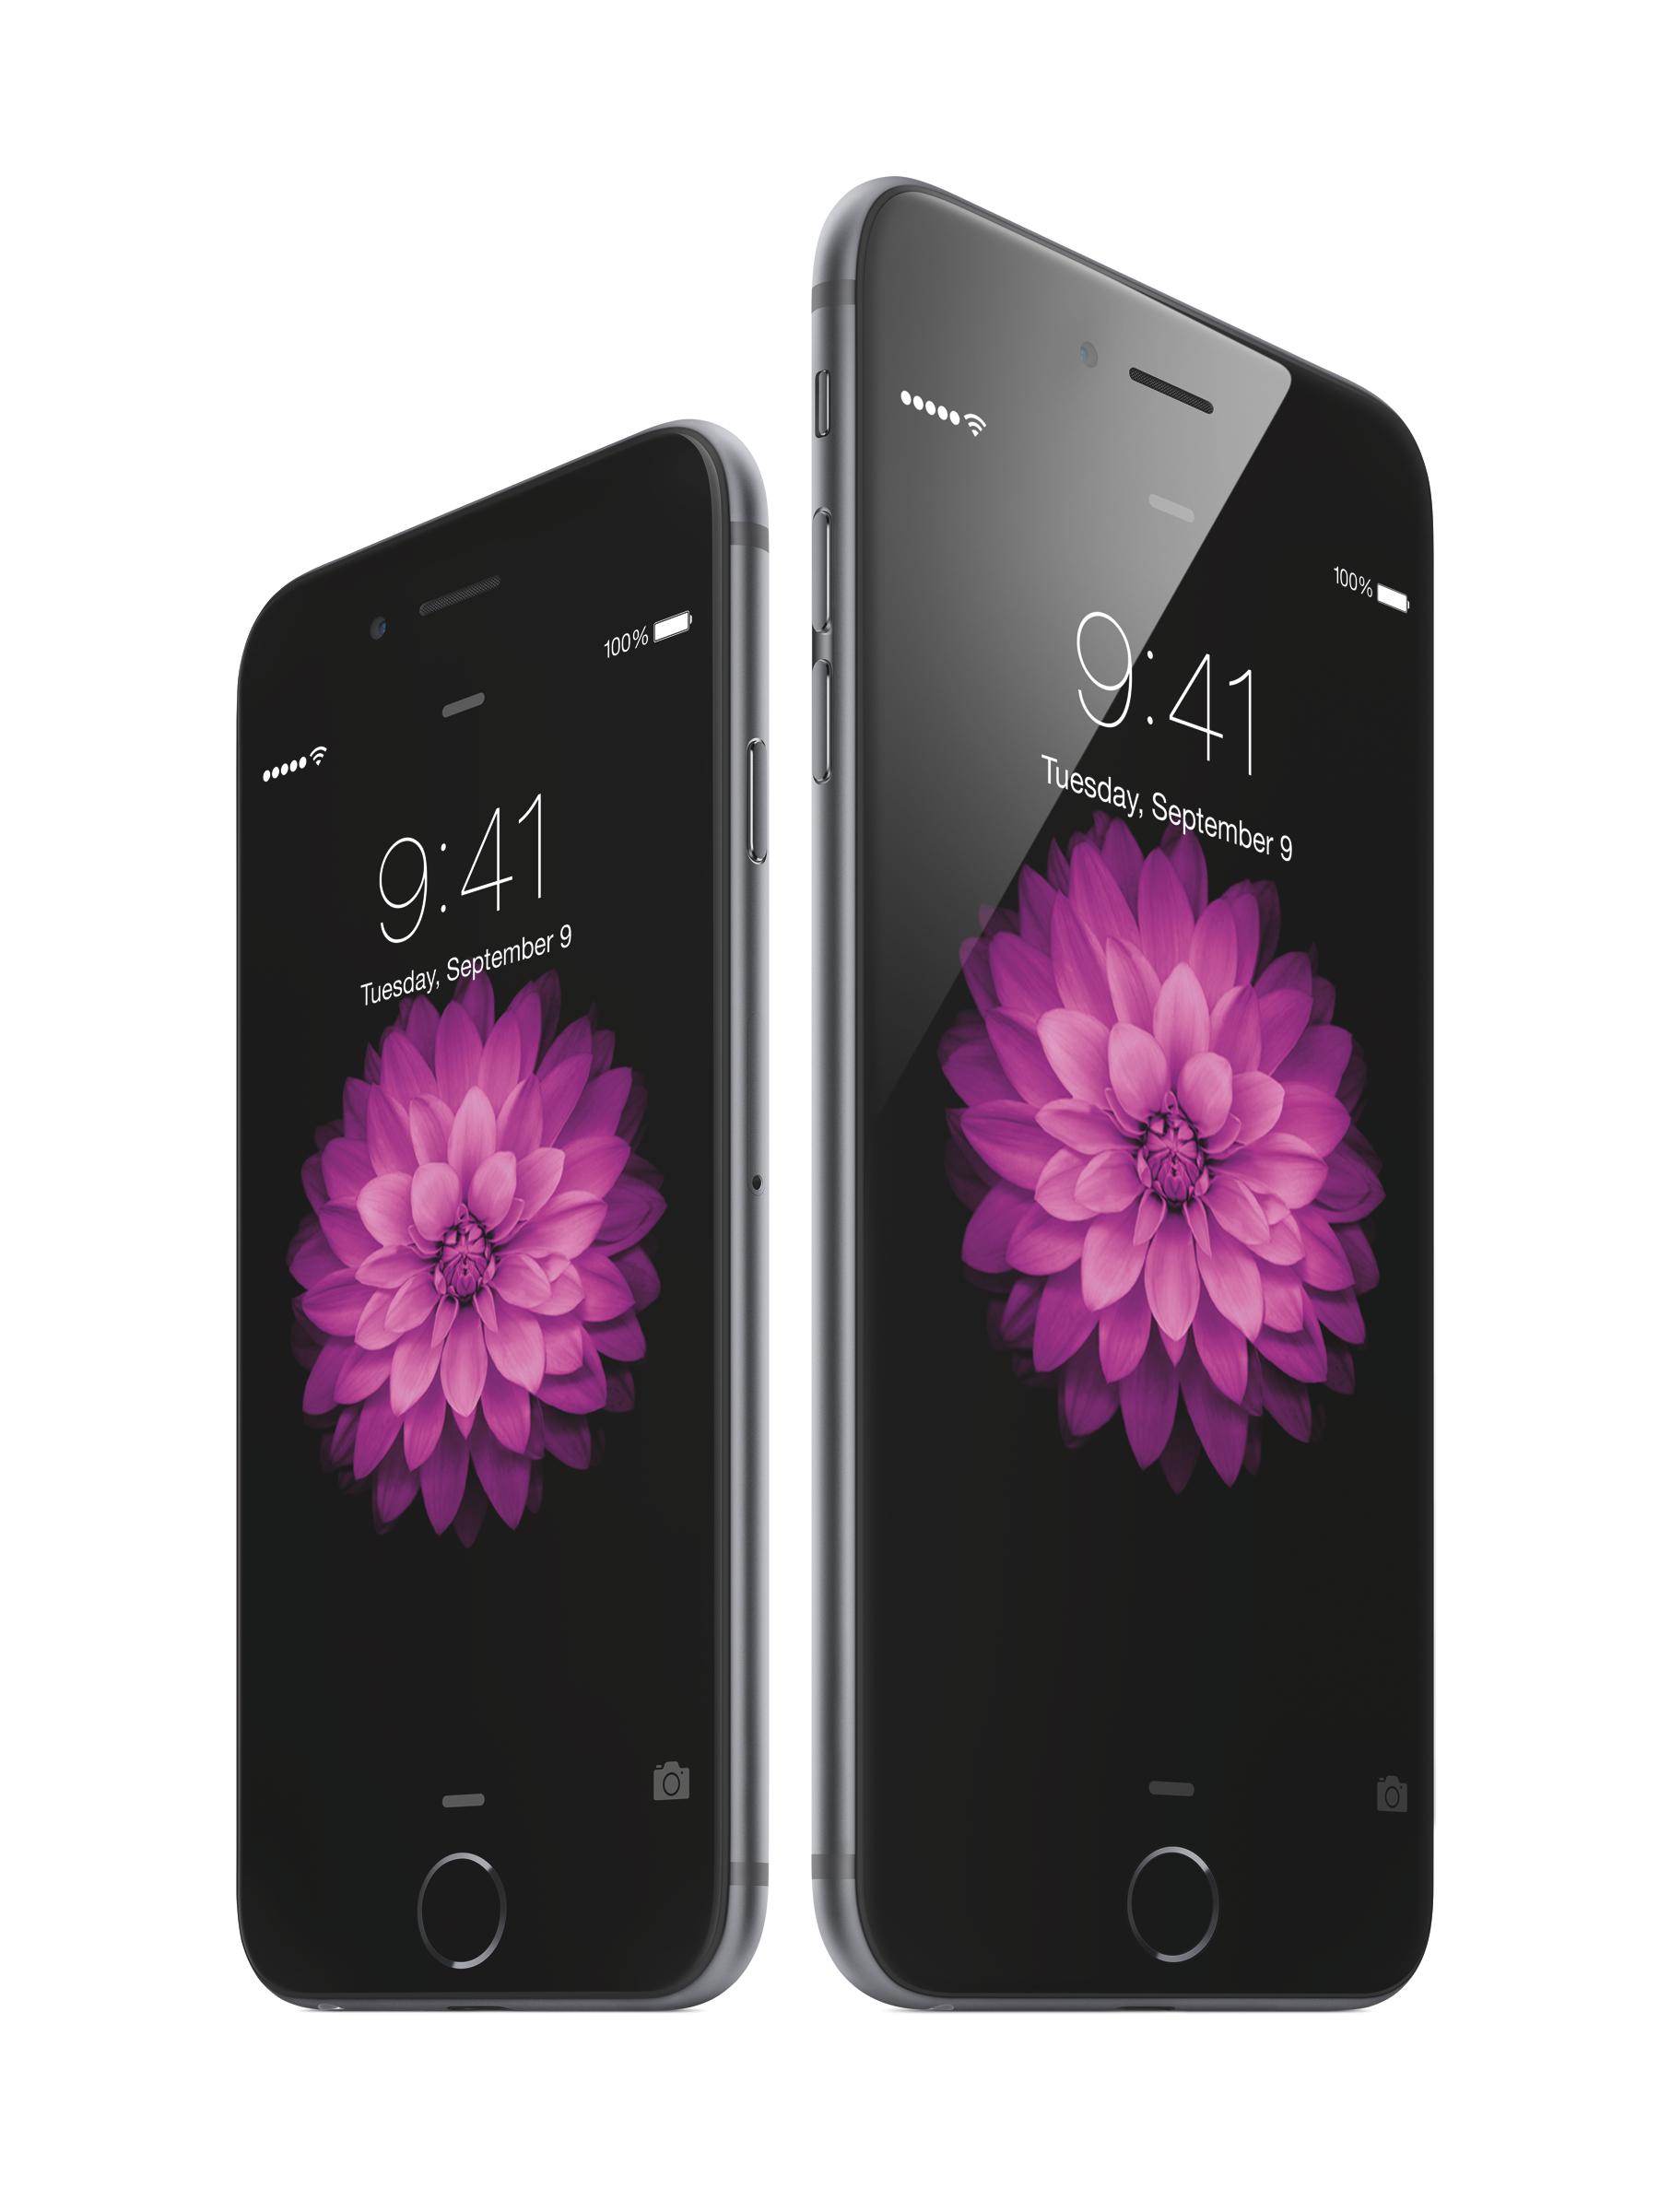 acheter iphone 6 plus chez free